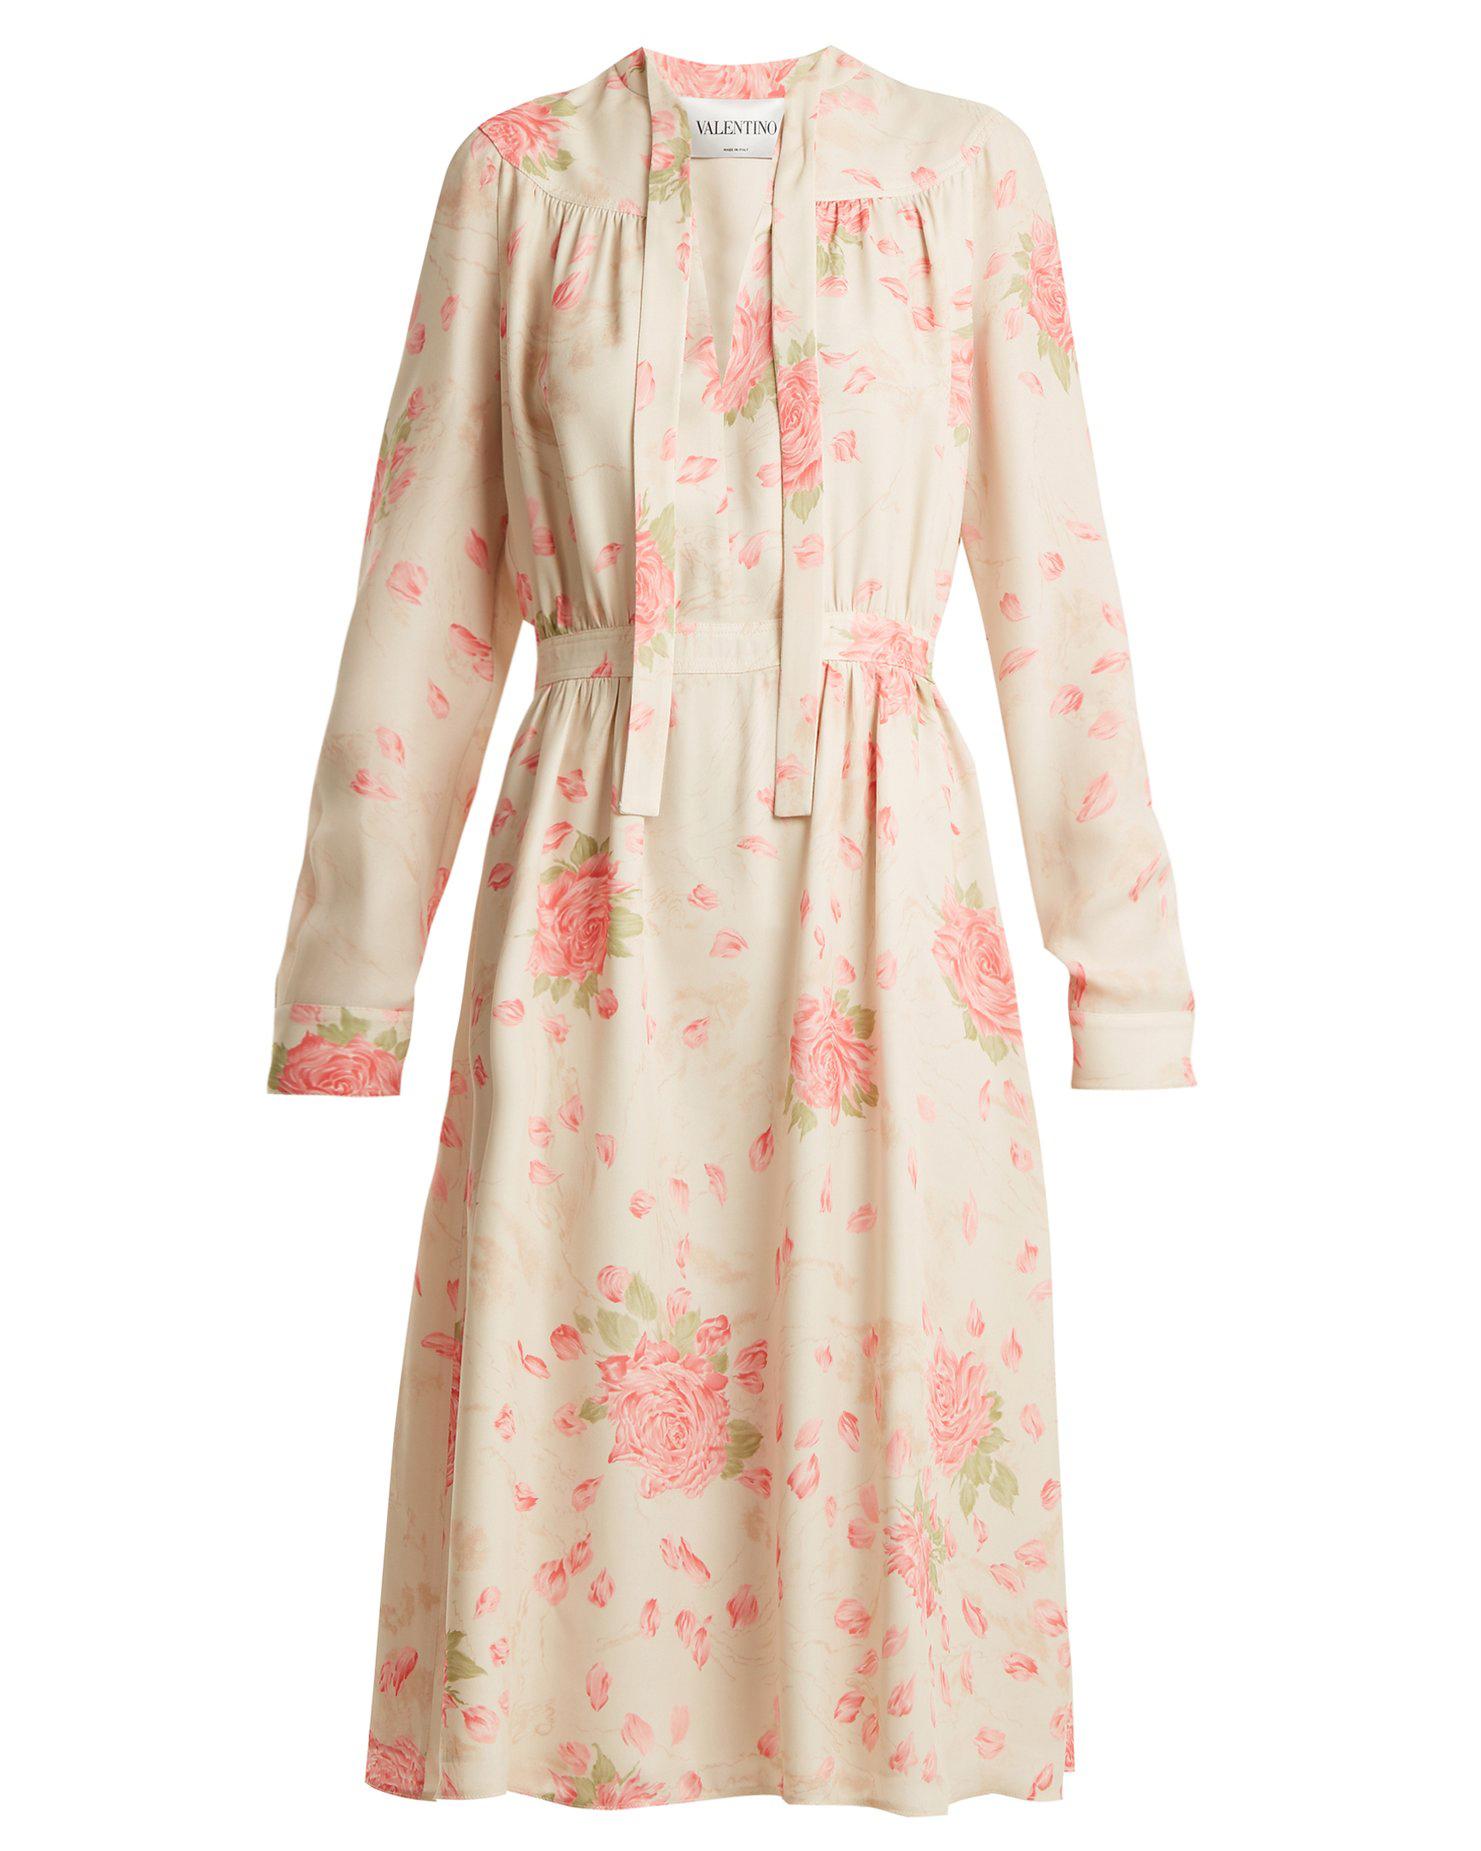 Valentino Rose-Print Dress